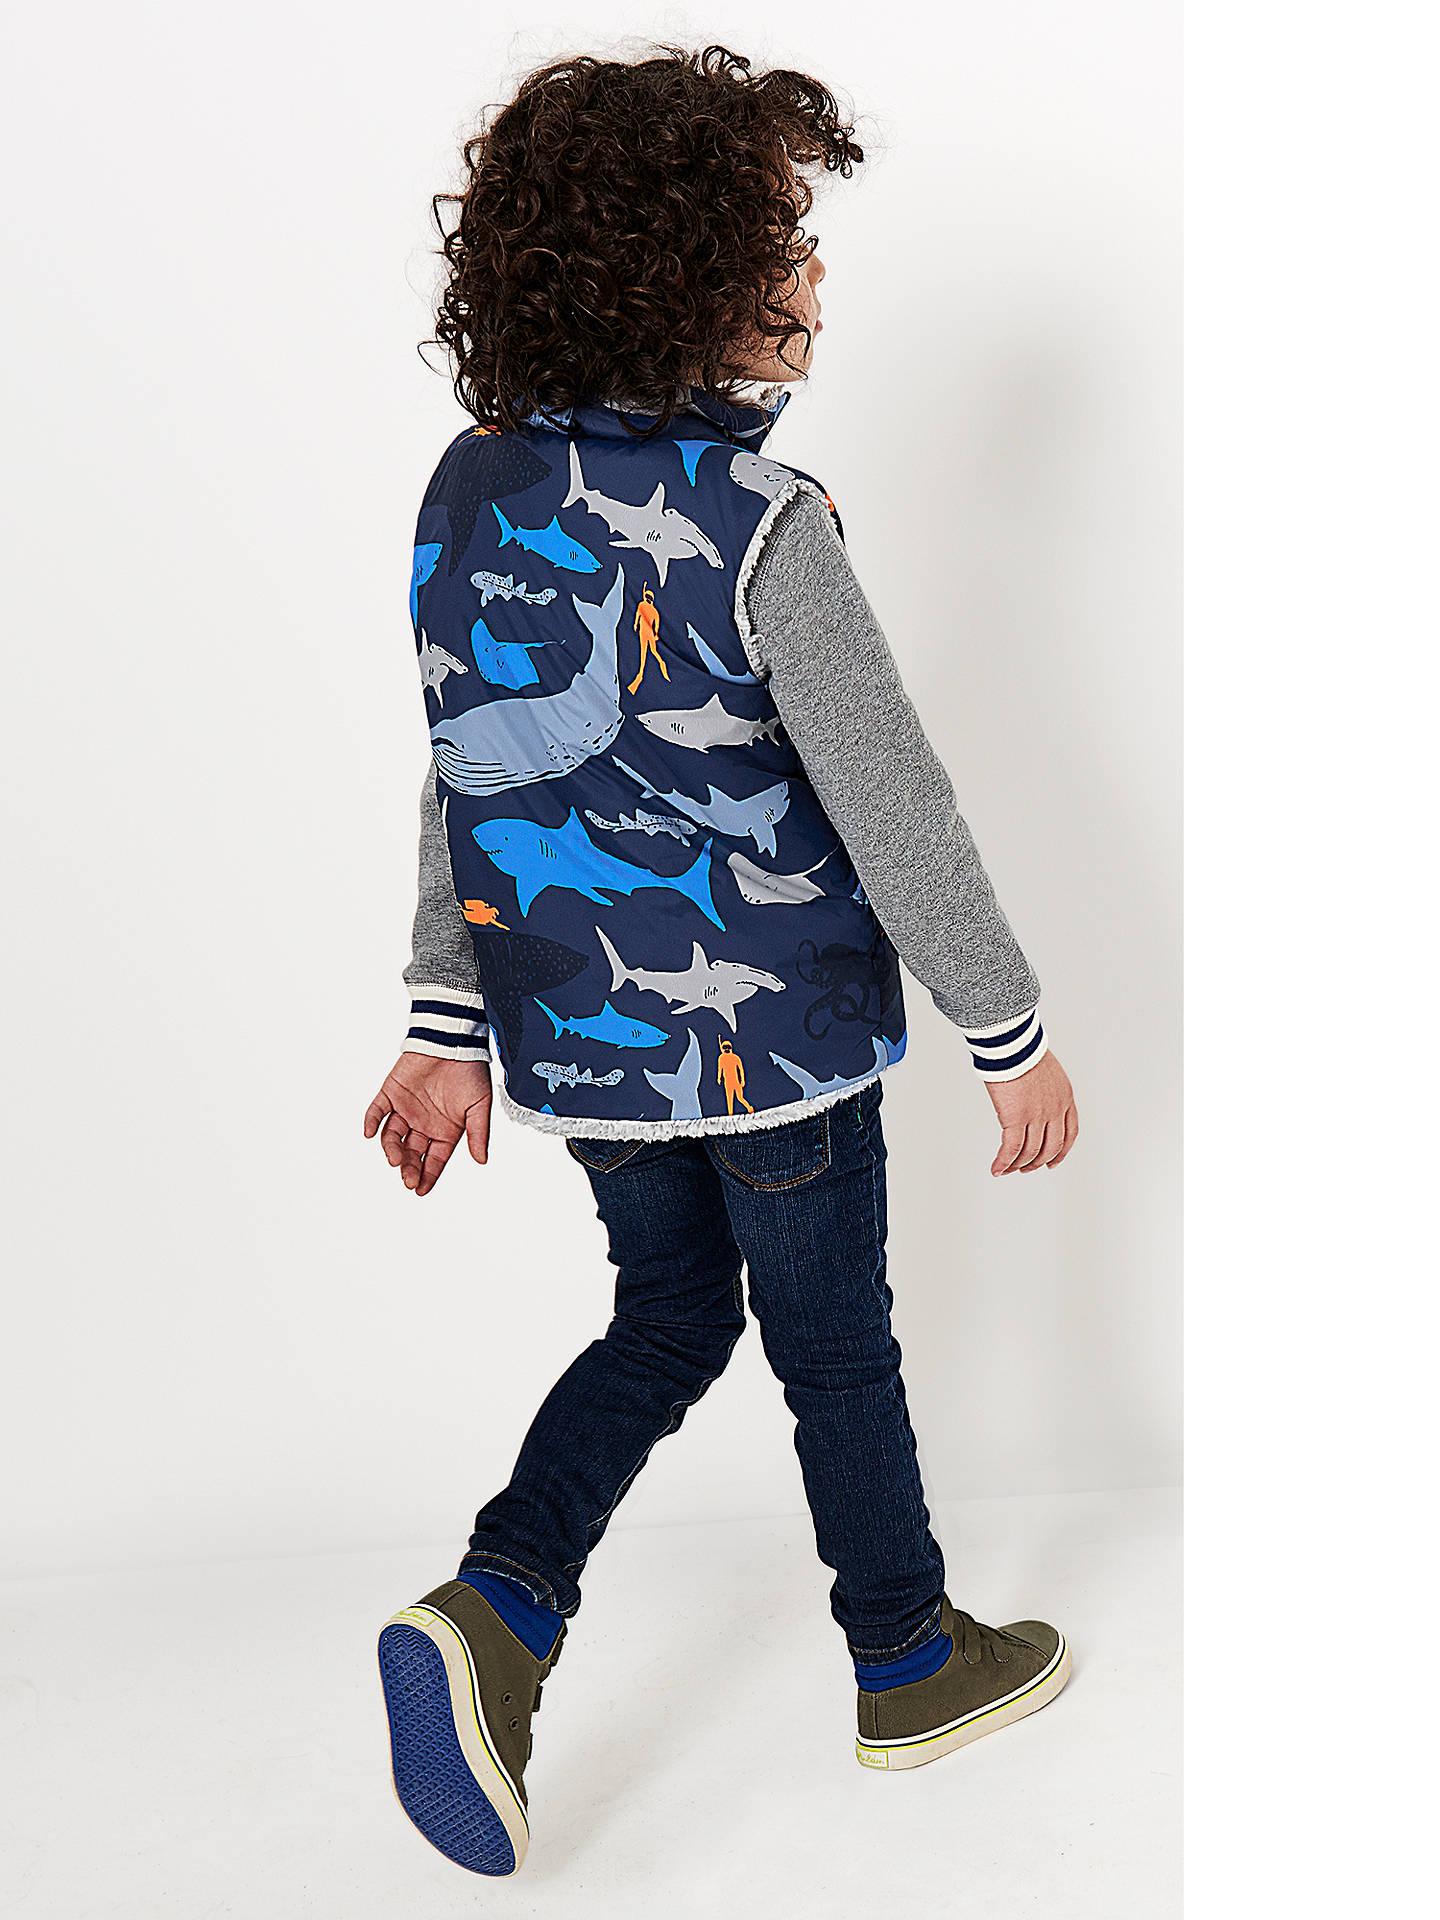 39b3bb575 ... Buy Mini Boden Boys' Shark Print Reversible Gilet, Blue, 2-3 years